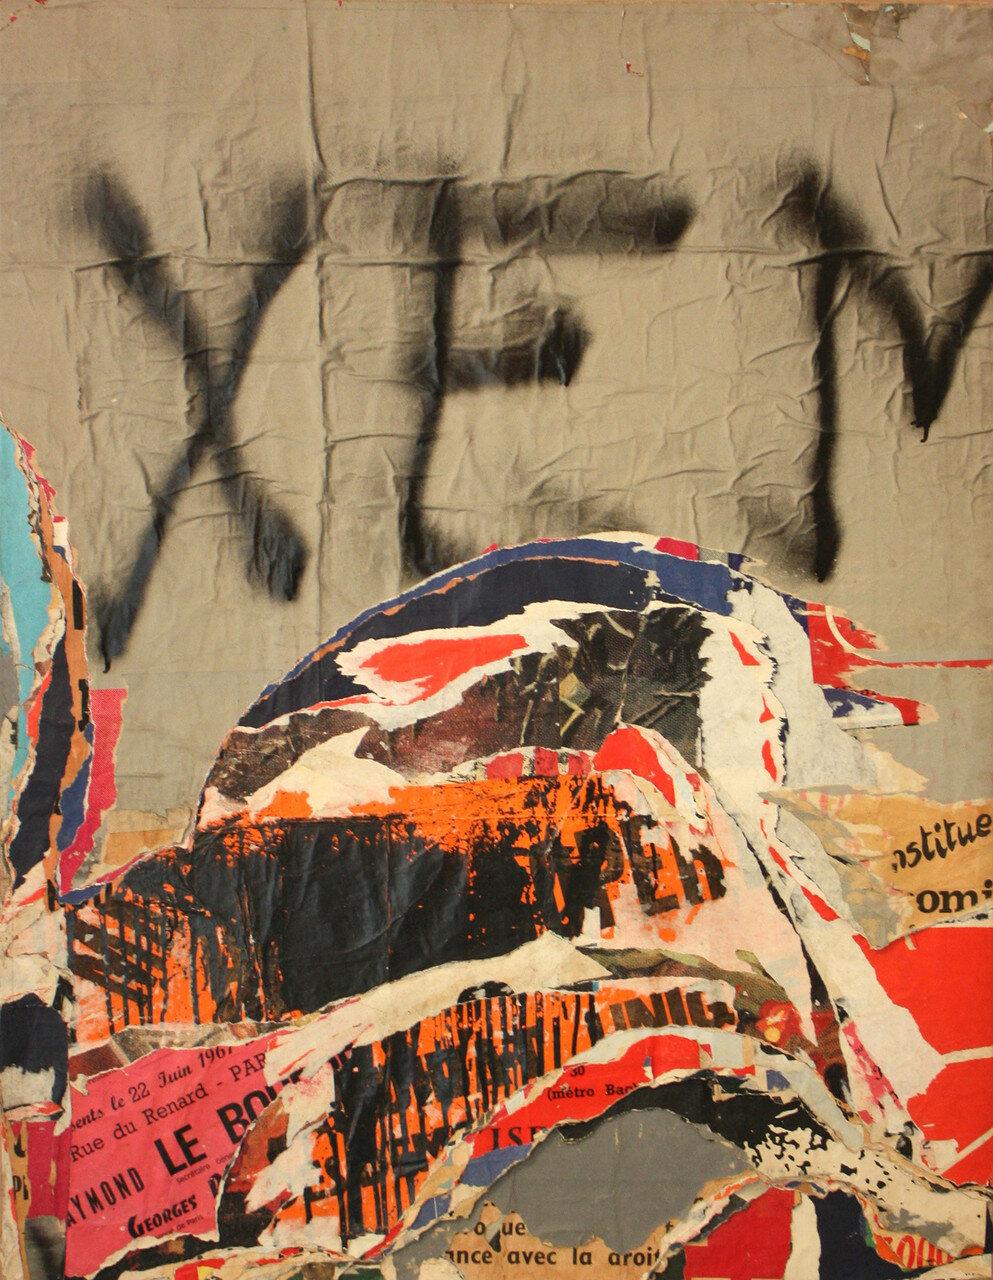 1968. Граффити. Улица Фобур дю Тампль